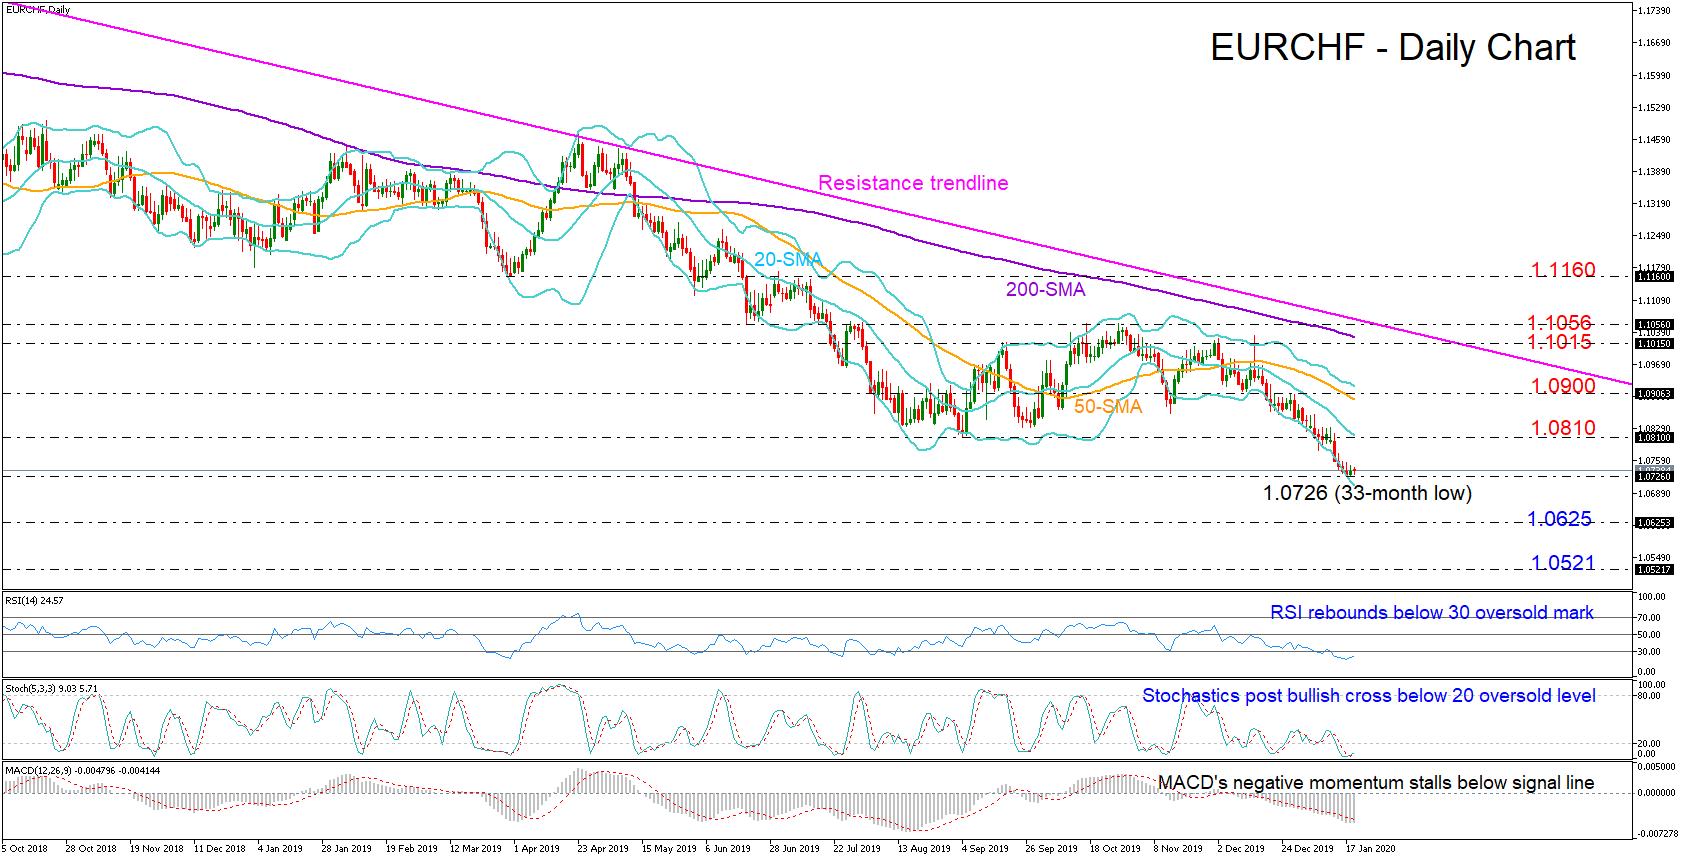 EURCHF